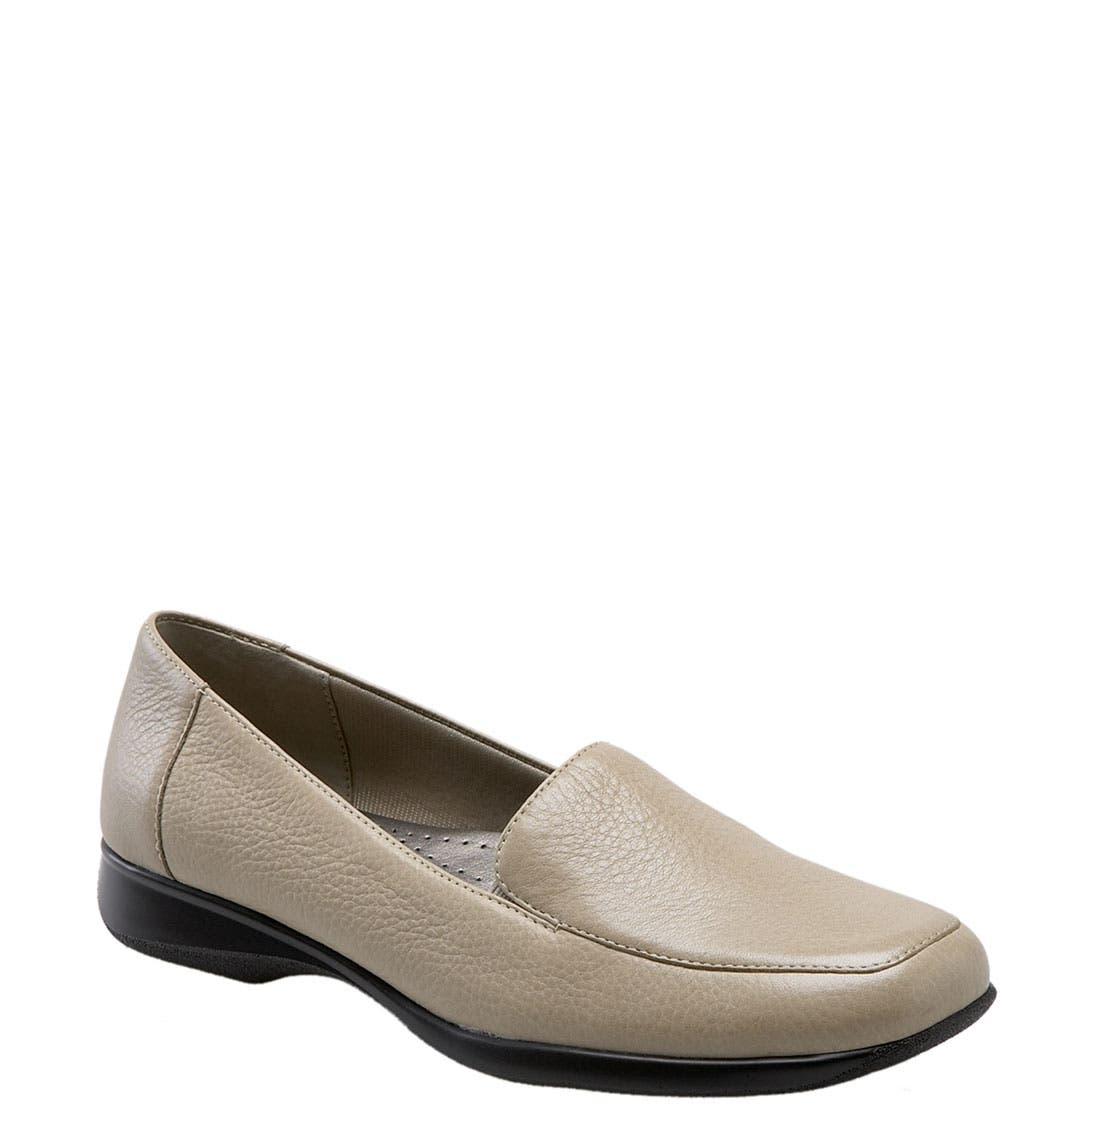 Trotters 'Jenn' Loafer